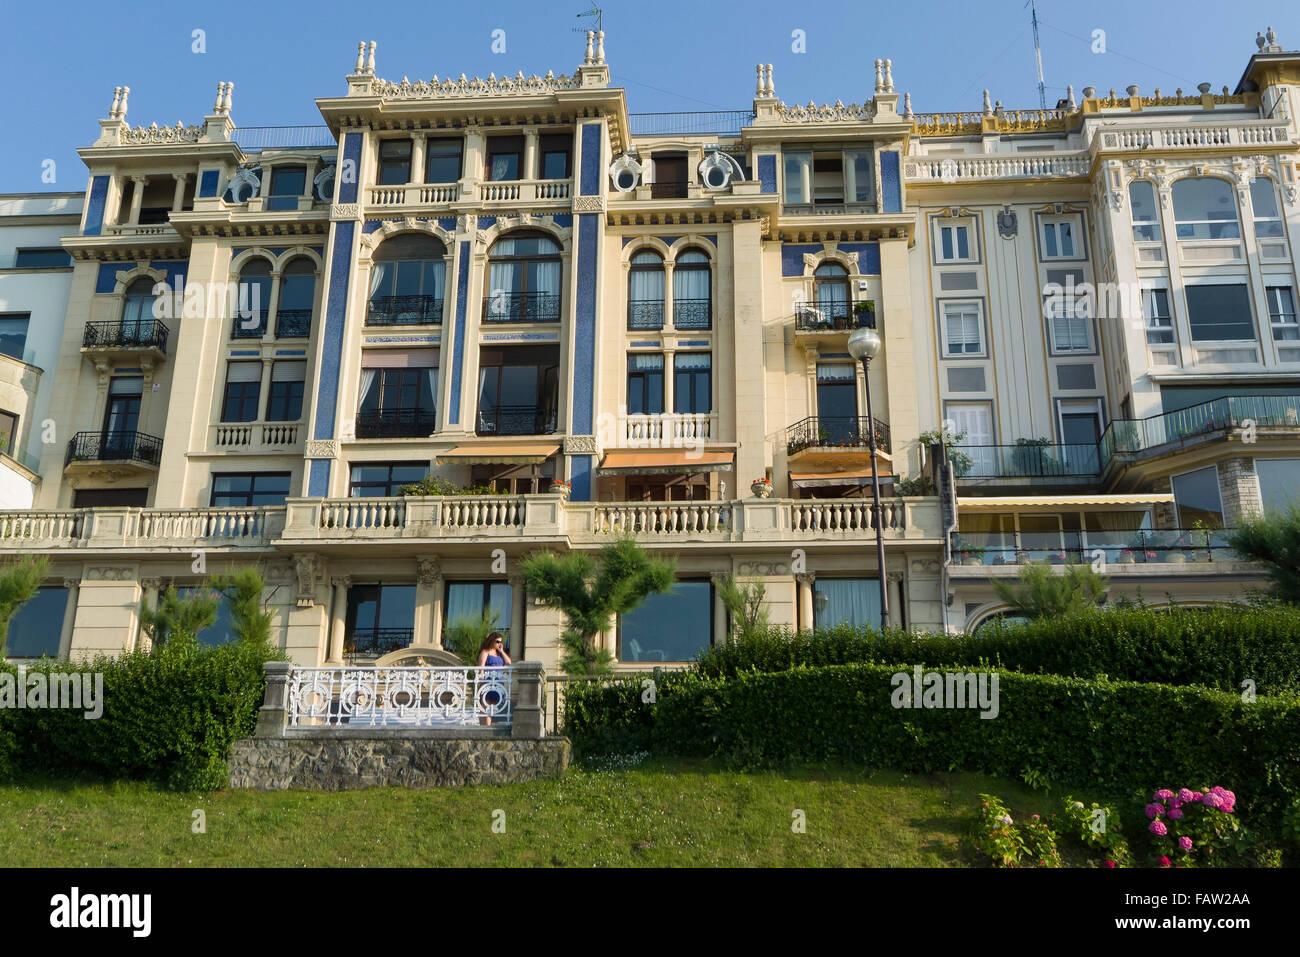 Houses on the beach promenade, San Sebastián, Gipuzkoa, Basque Country, Spain - Stock Image